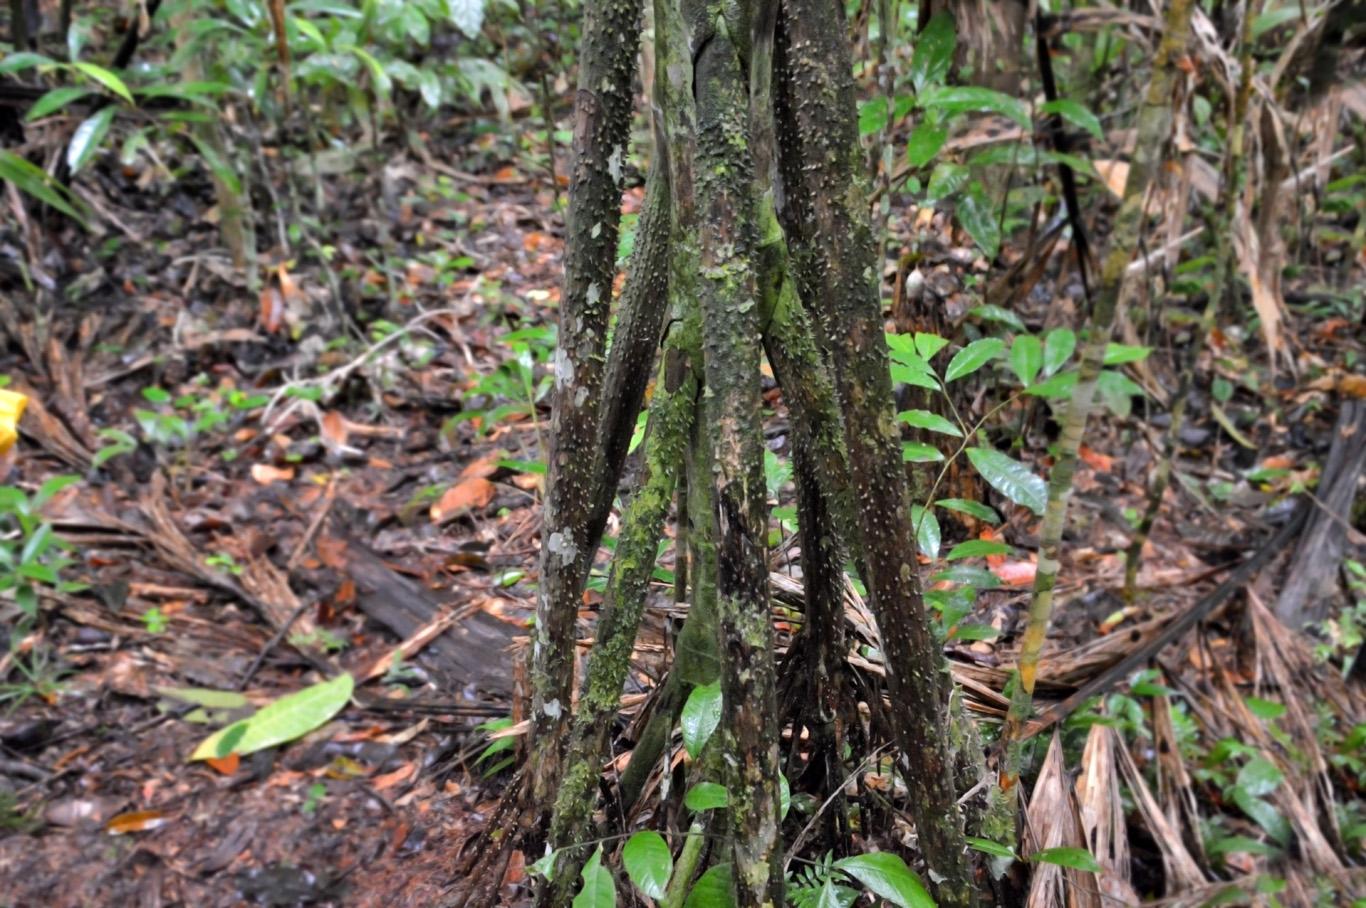 The trunk of Chambira